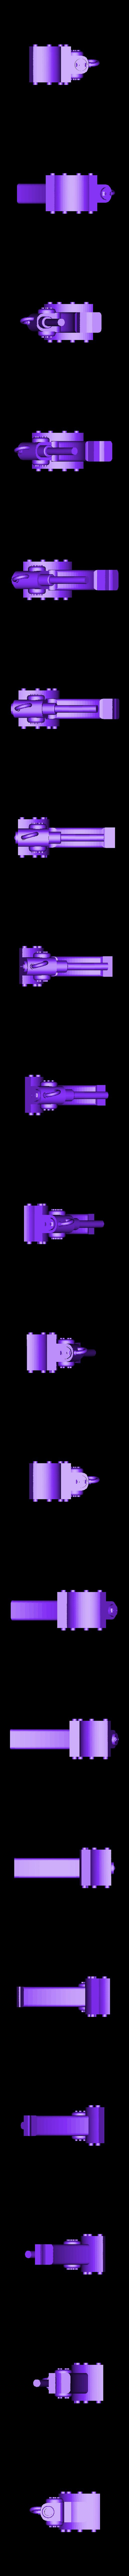 Lower_Leg.stl Download free STL file Imperial Crusader Mech - New Legs • 3D printable model, GarinC3D